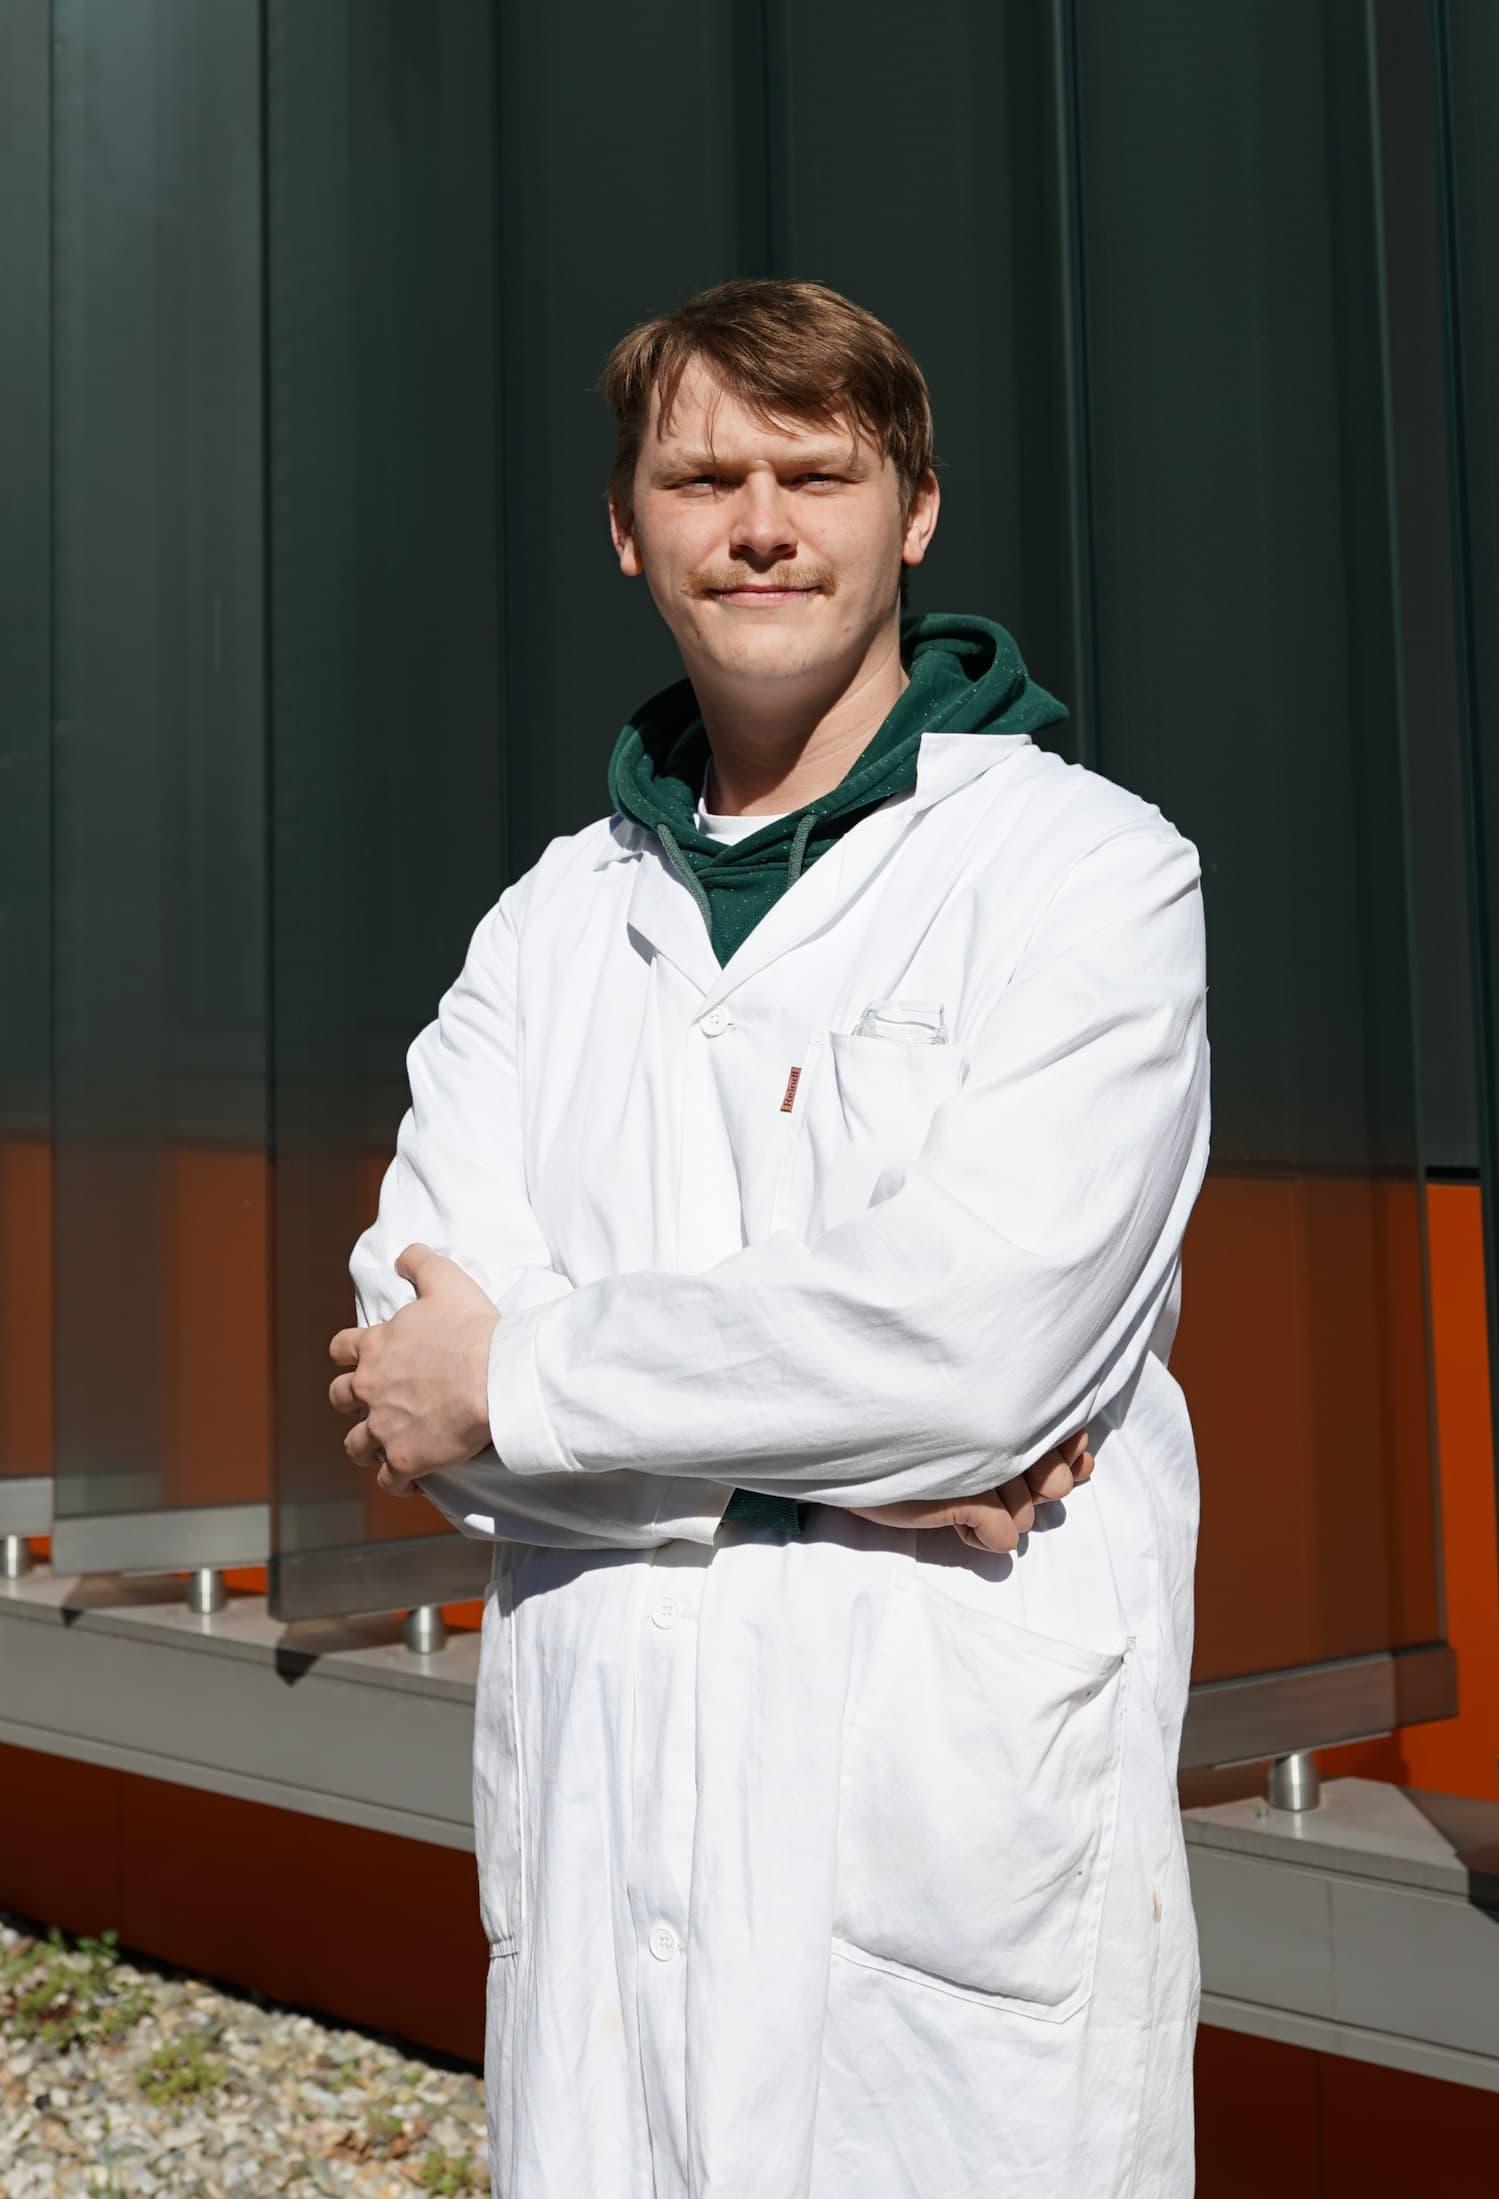 Georg Blüthner